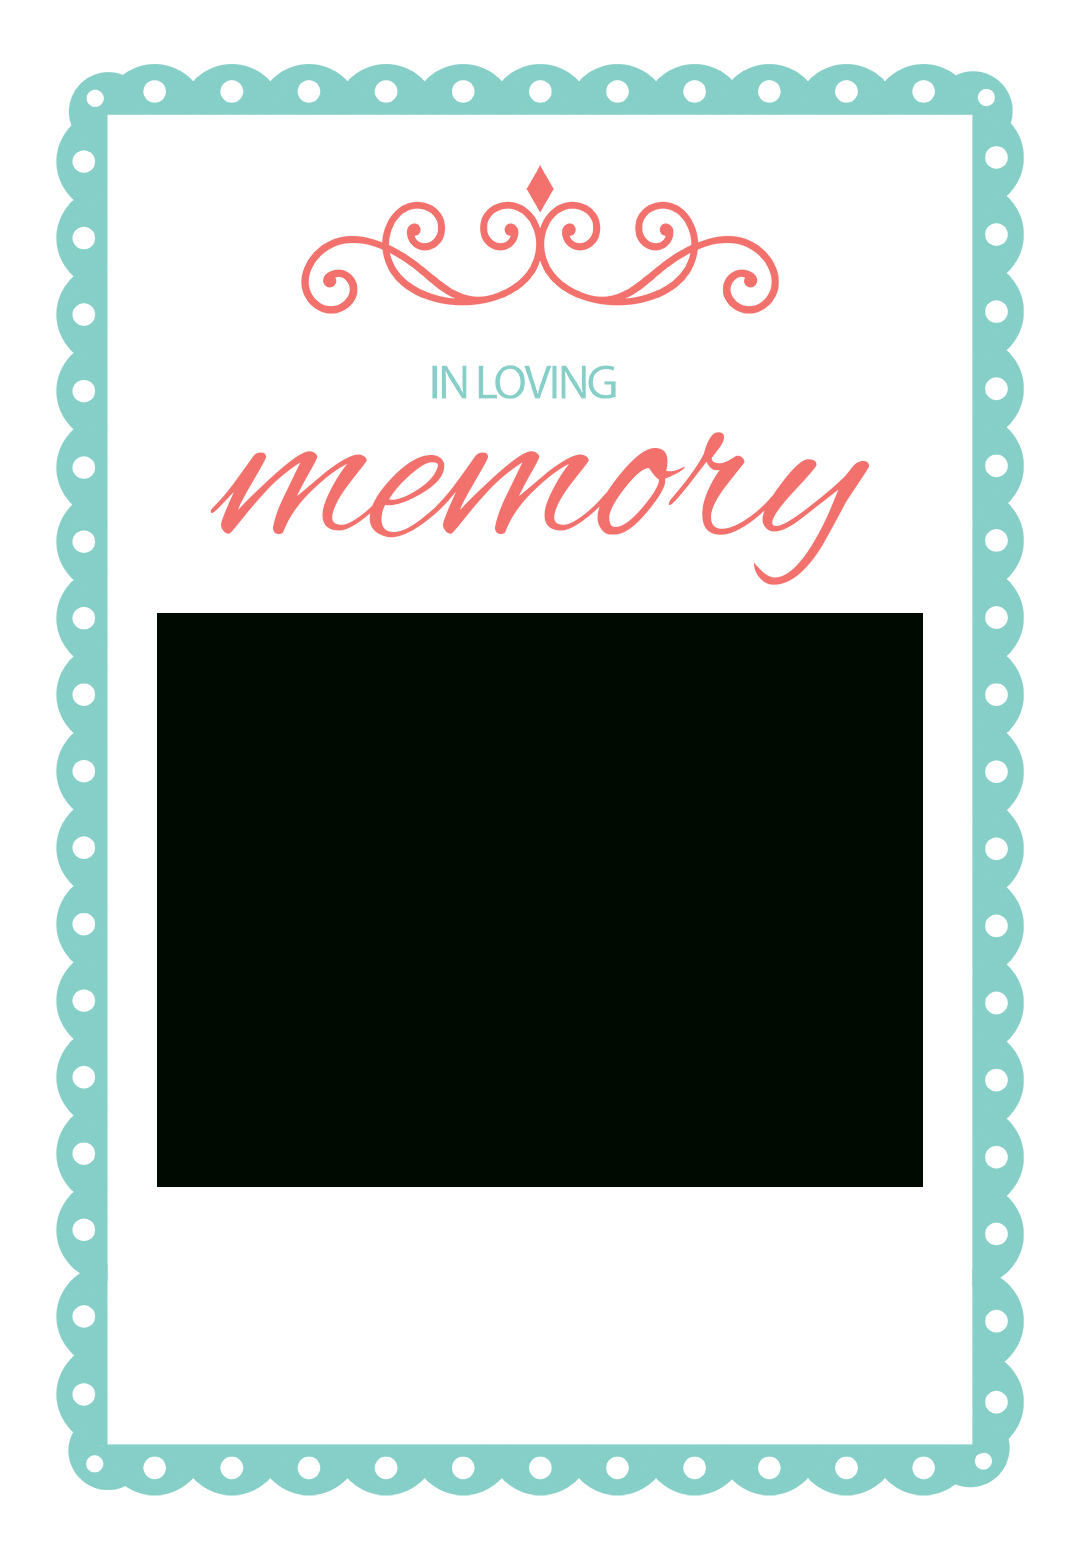 In Loving Memory  Free Memorial Card Template  Greetings Island Pertaining To In Memory Cards Templates